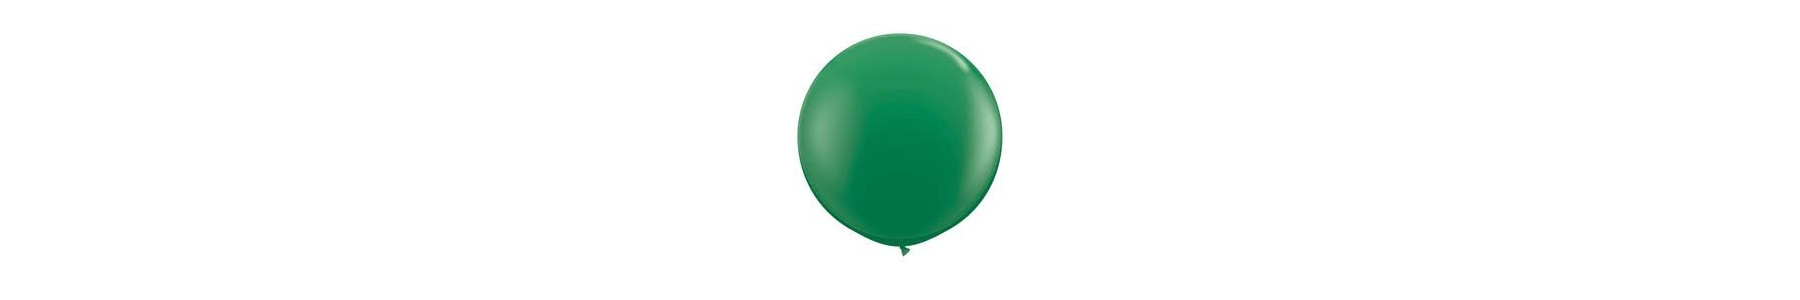 Baloane latex jumbo 80 cm